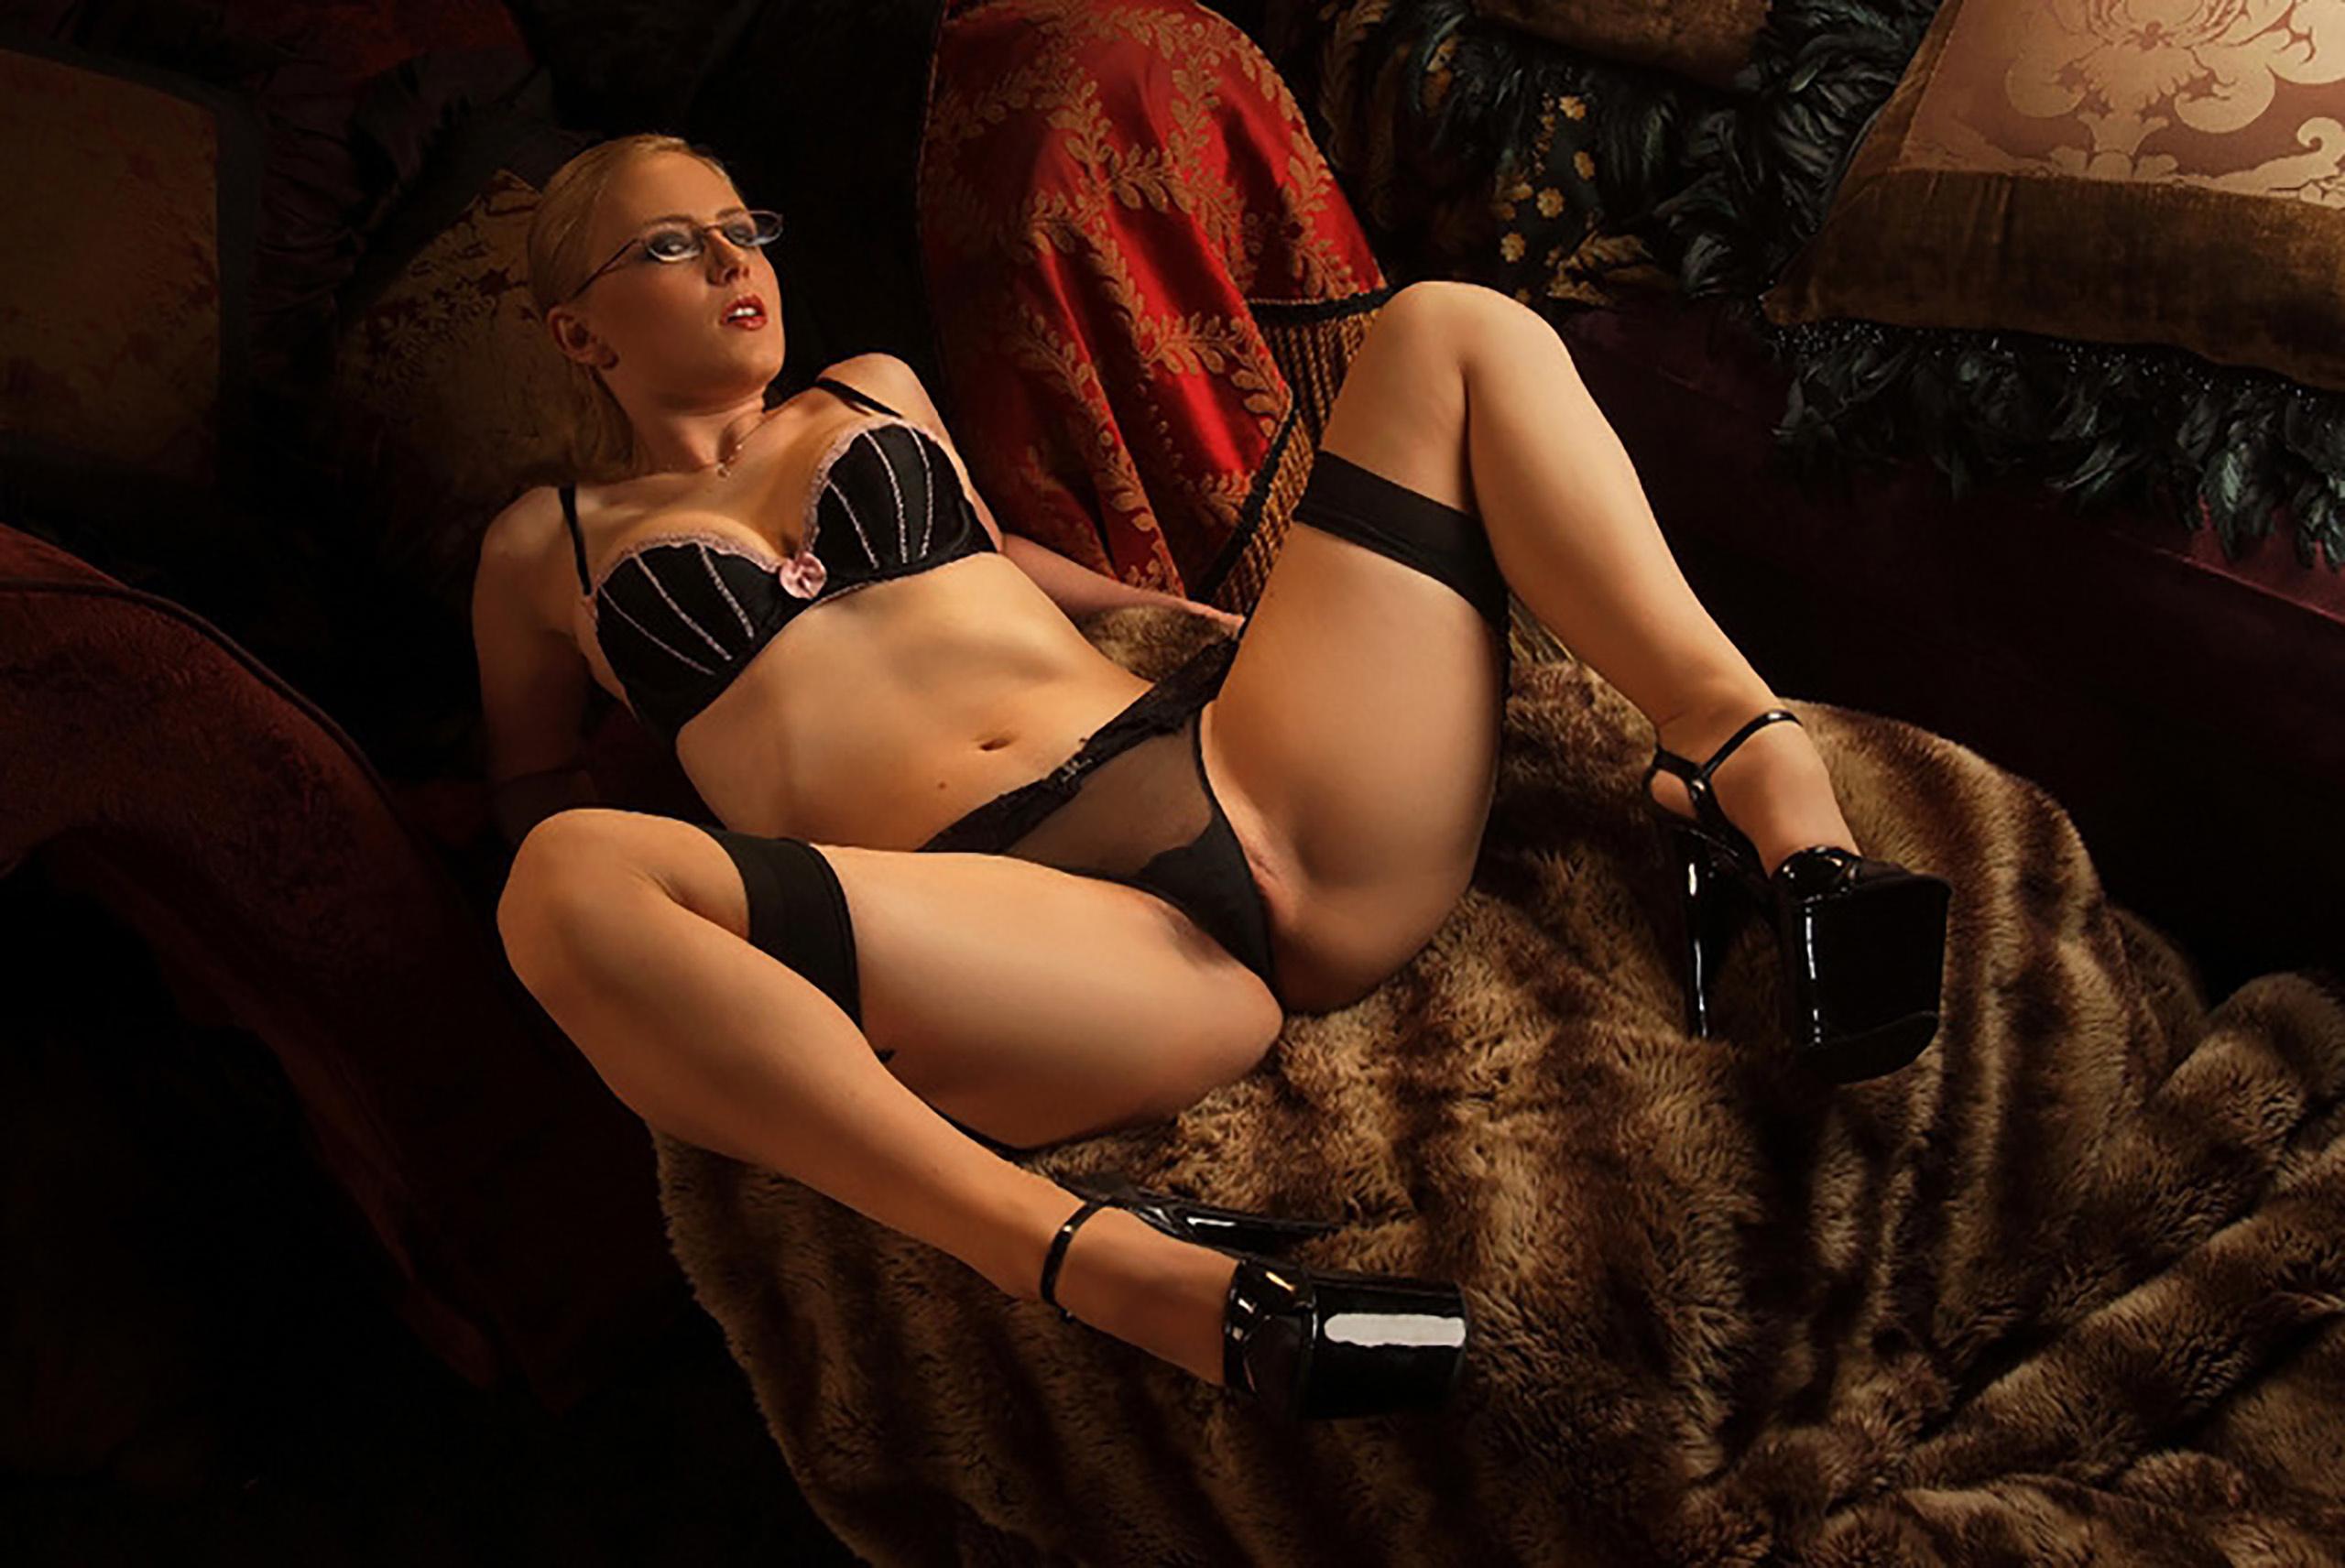 Sexy lingerie striptease daftsex